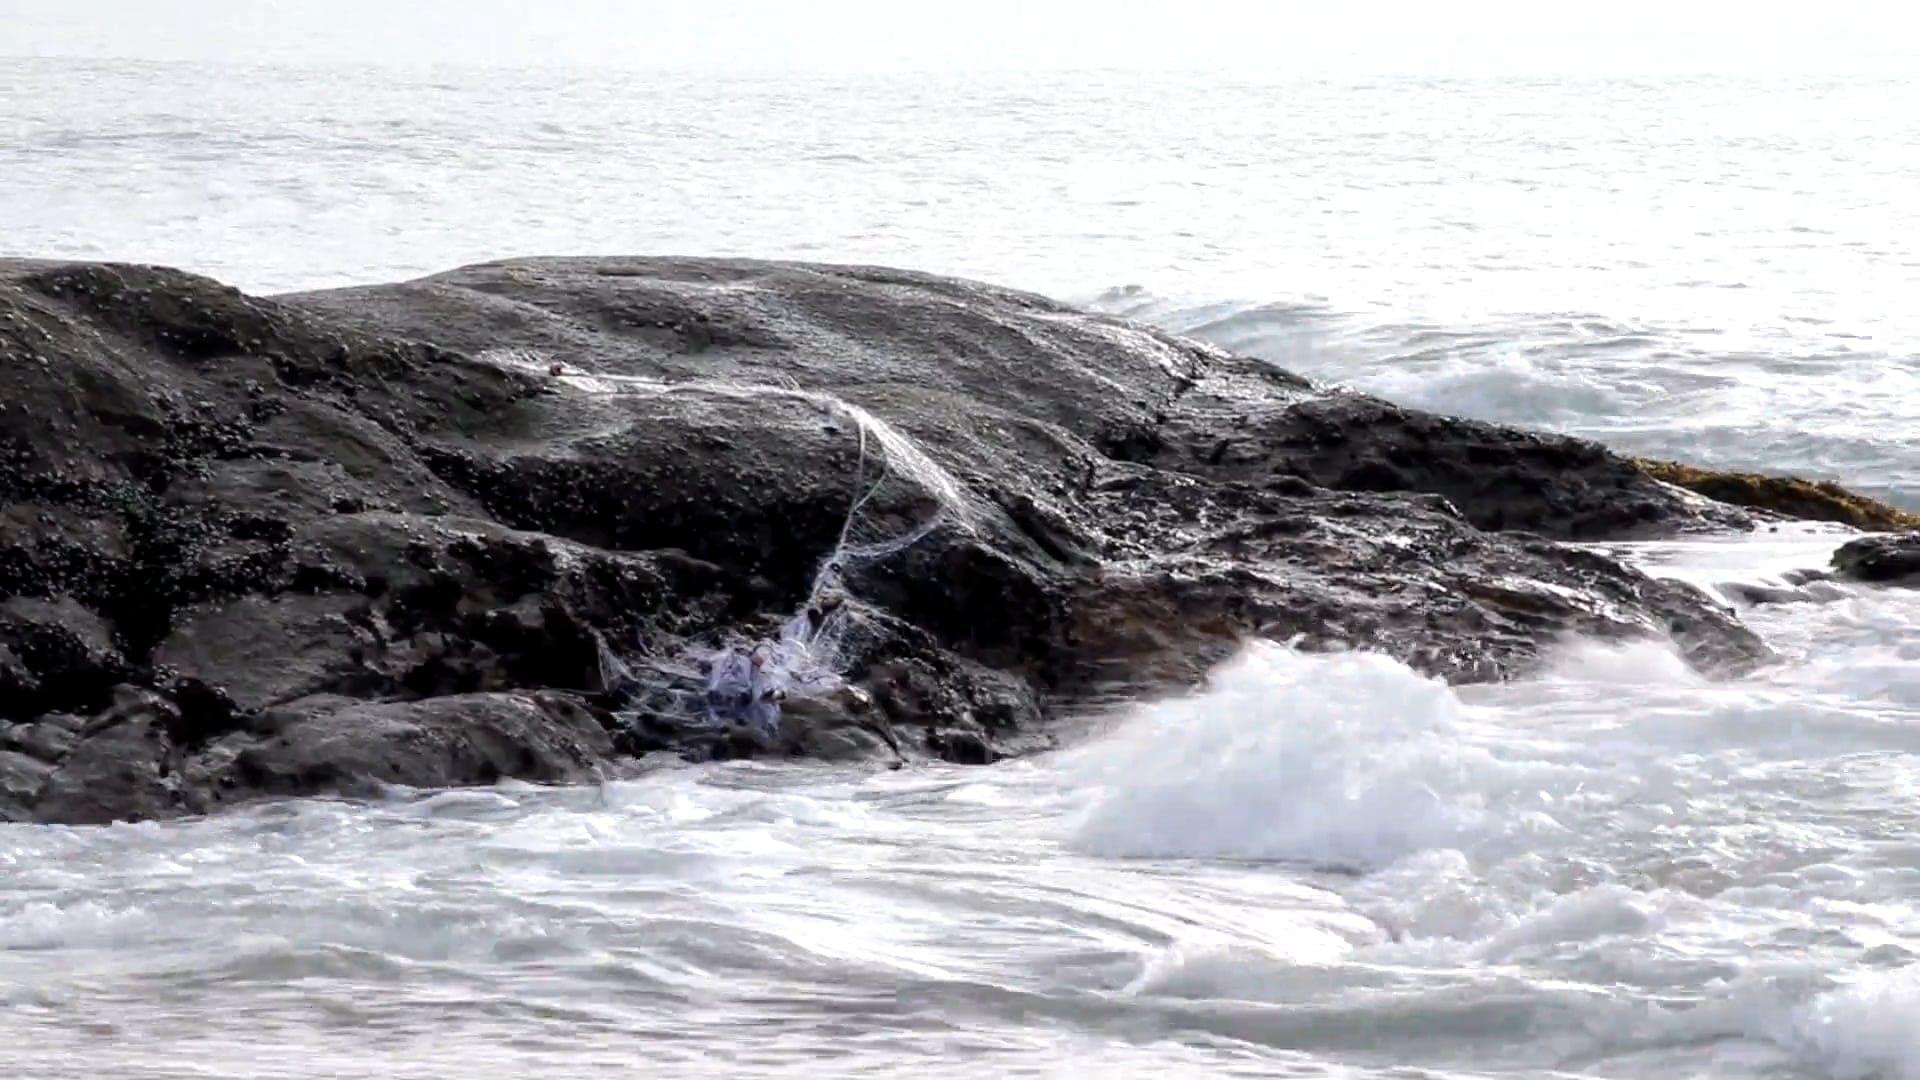 Waves Crashing On A Rock